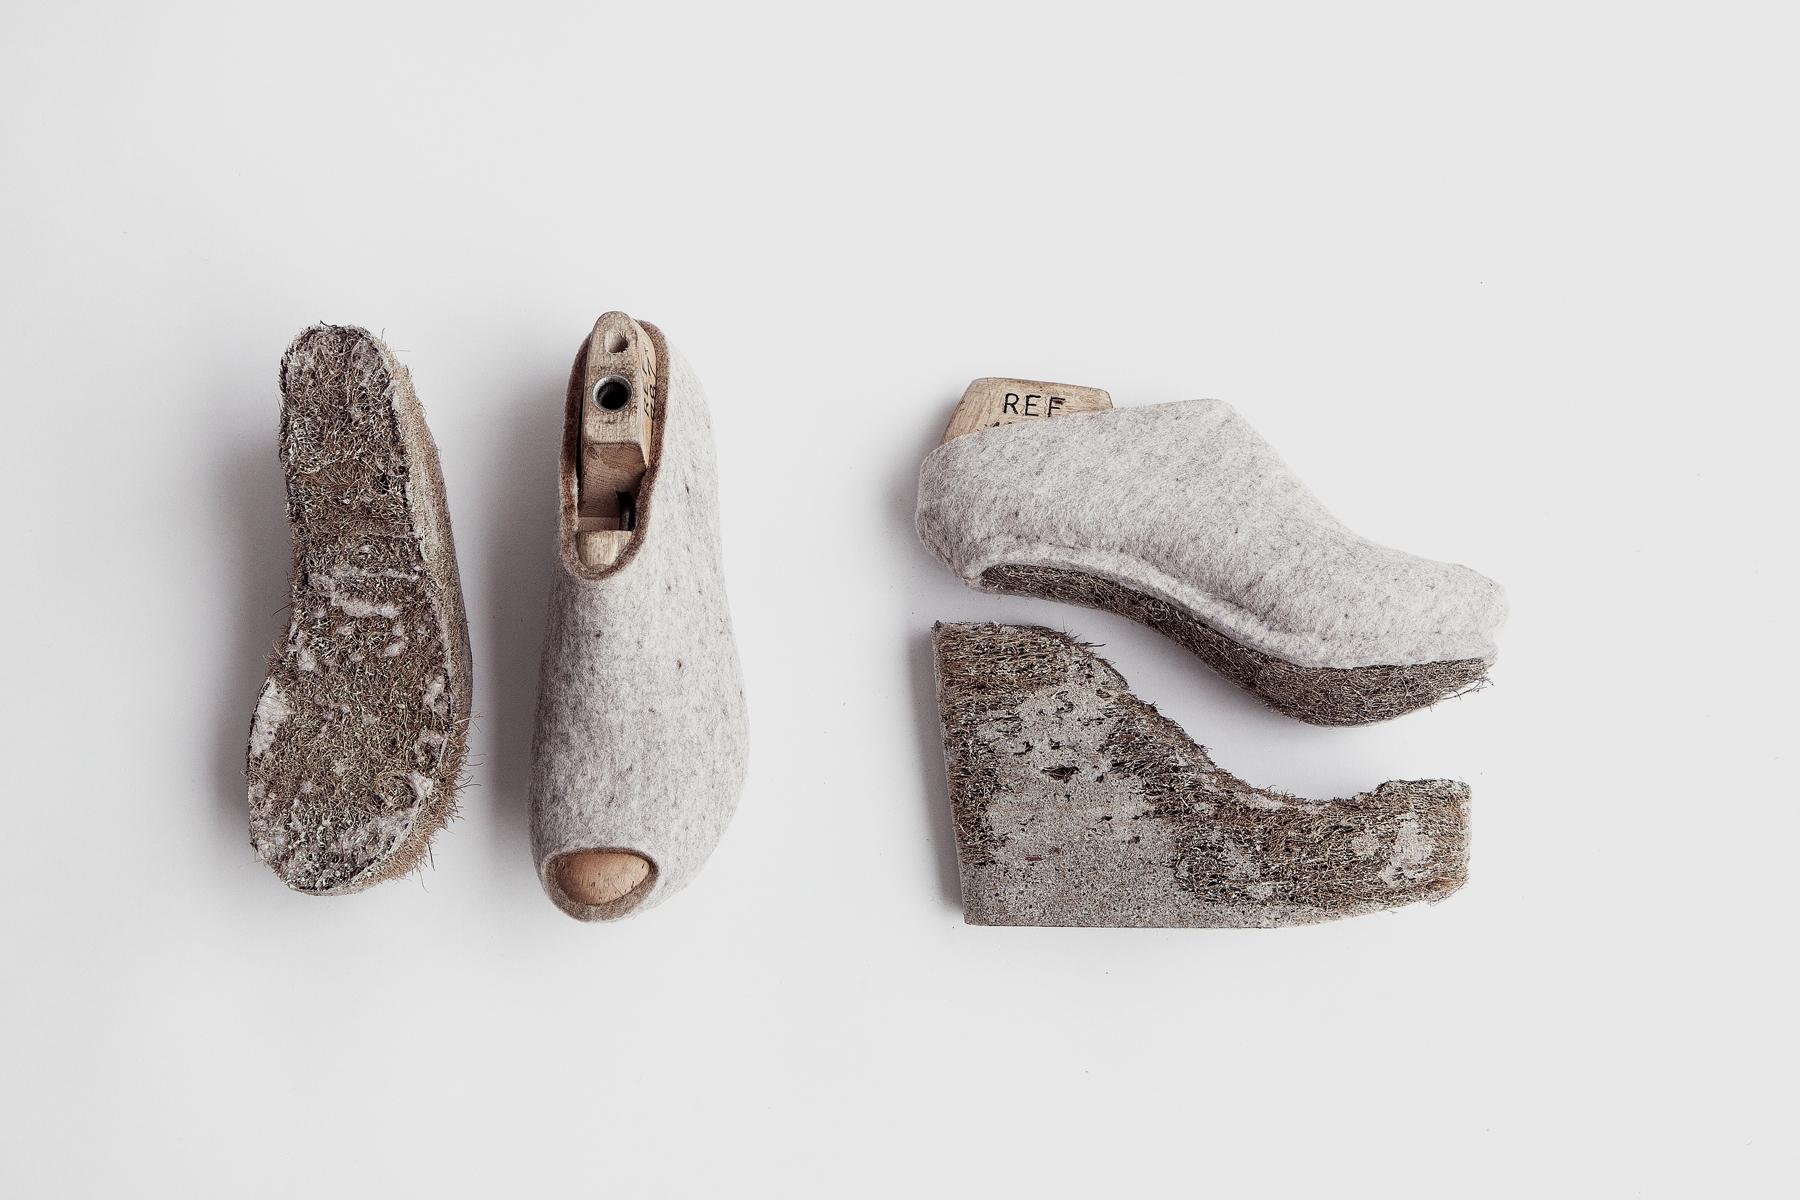 Cocolok shoes by Liz Ciokajlo